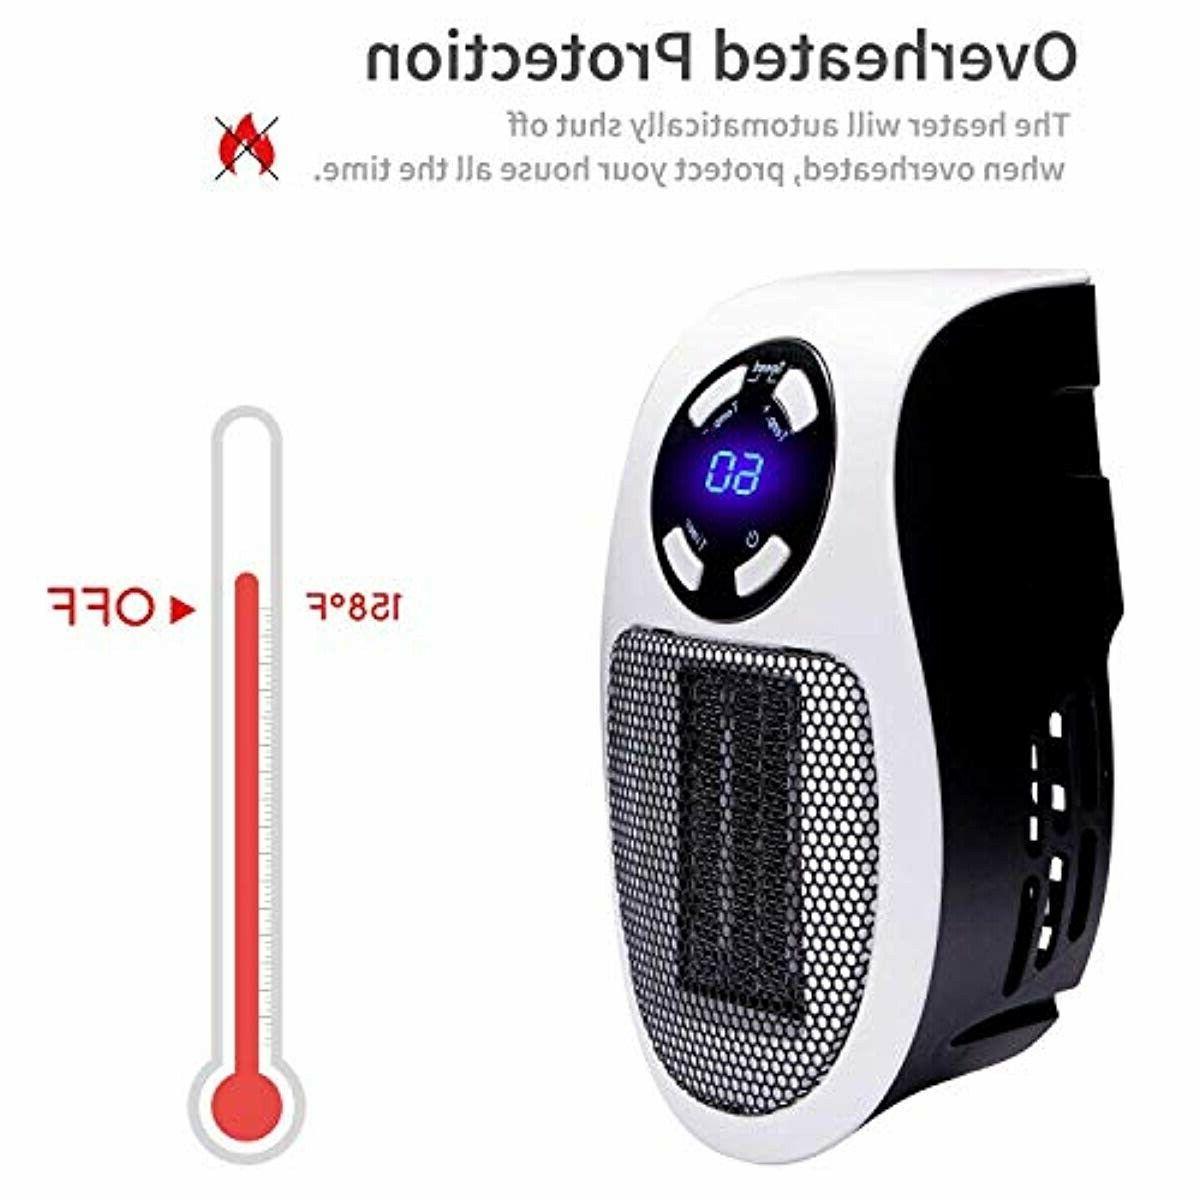 Heater, Ceramic Heater Portable